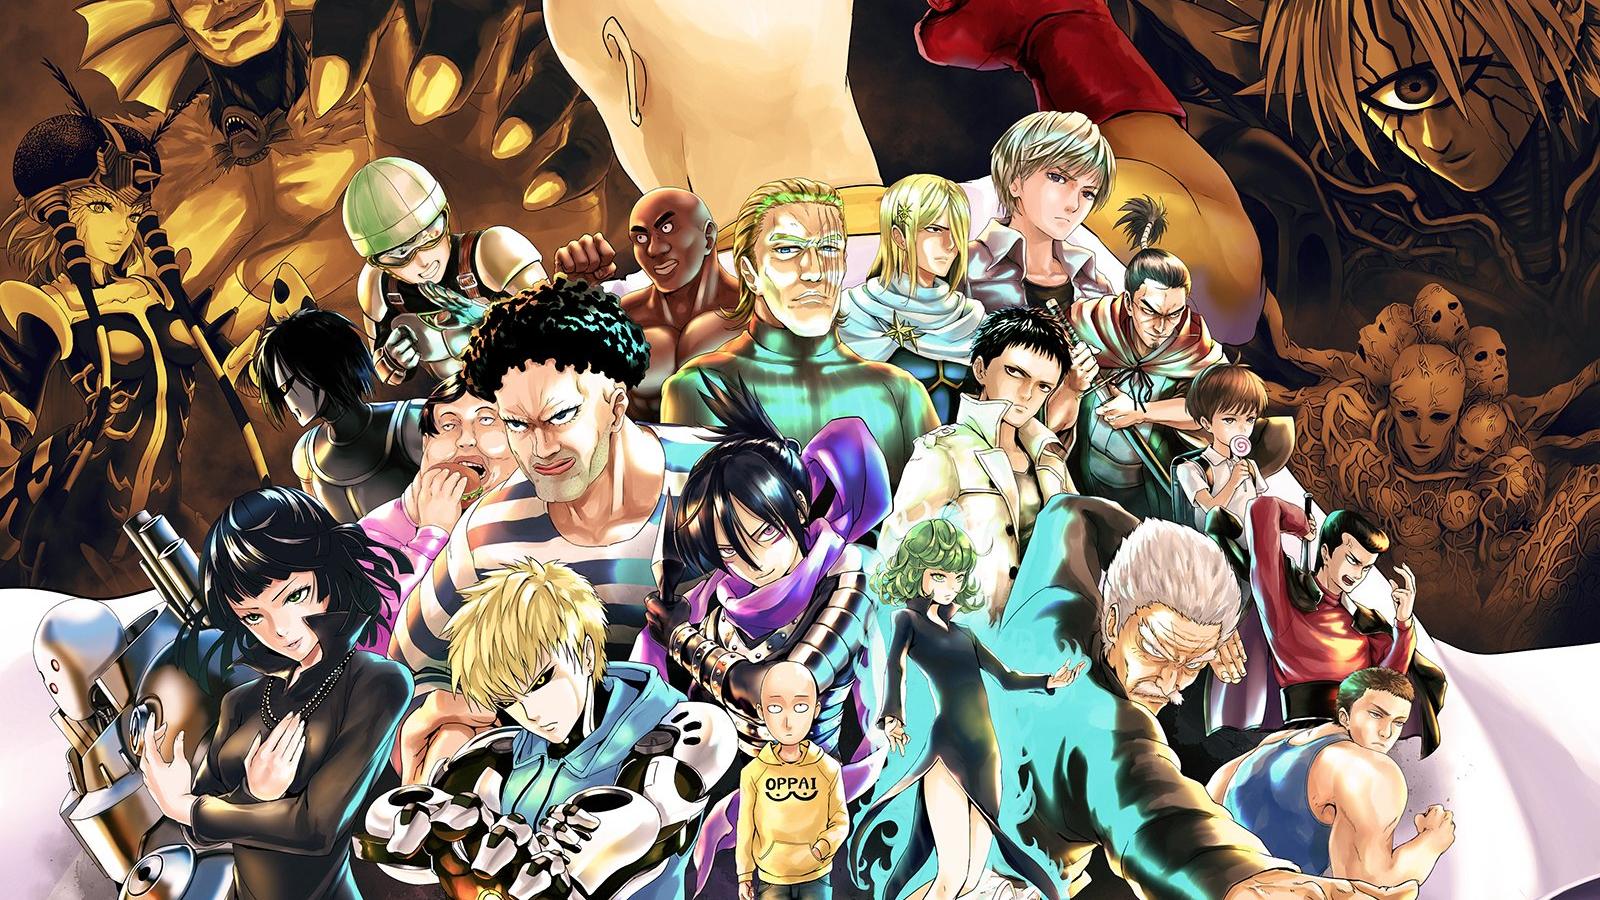 Free Download 76 Tatsumaki One Punch Man Hd Wallpapers Background